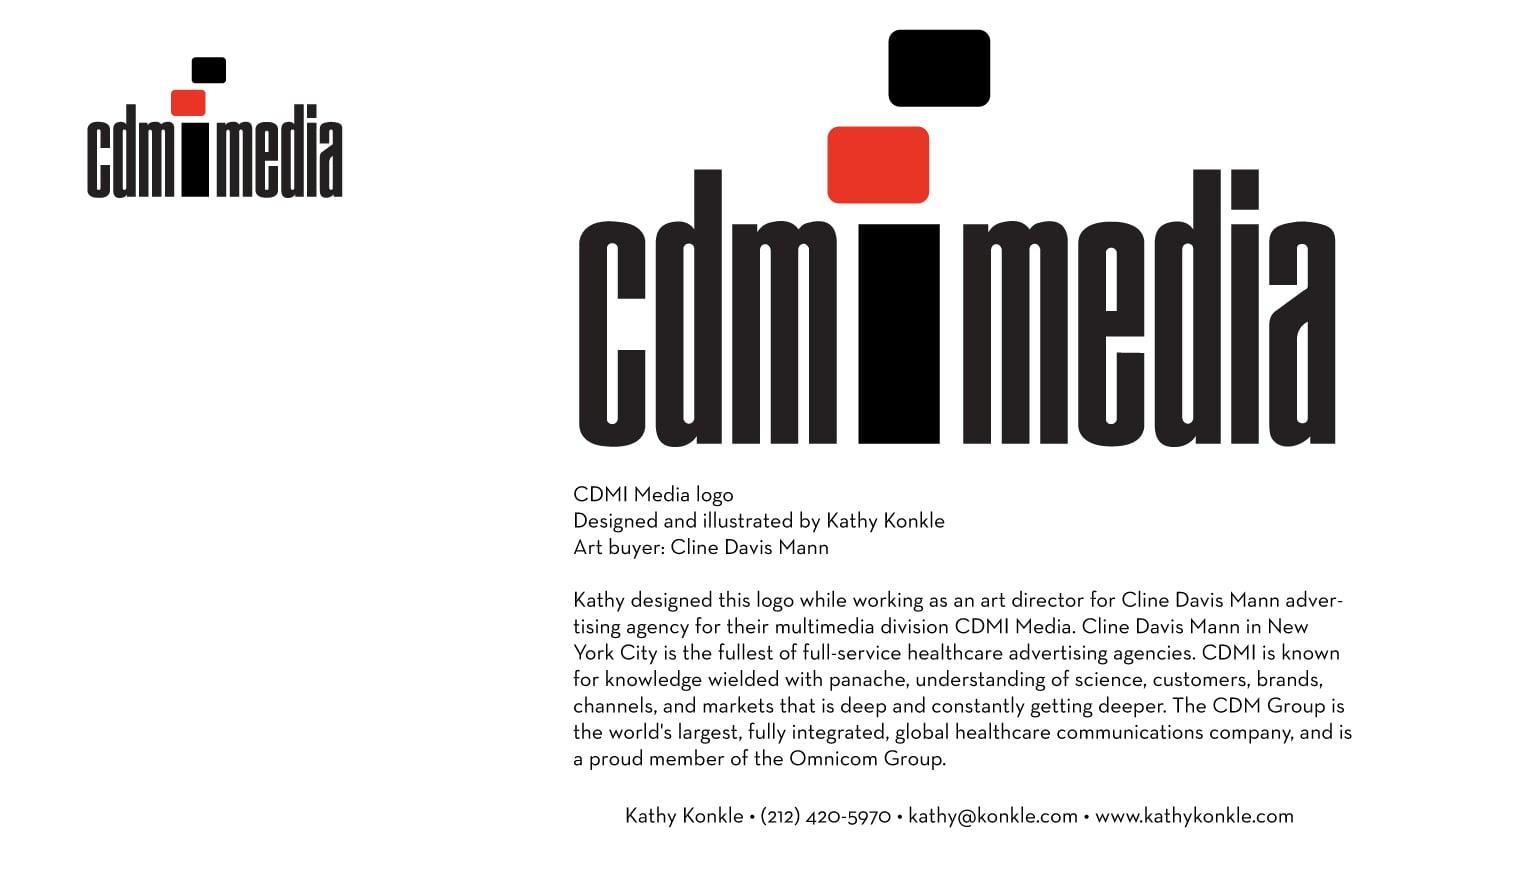 CDMI-Media-logo.jpg